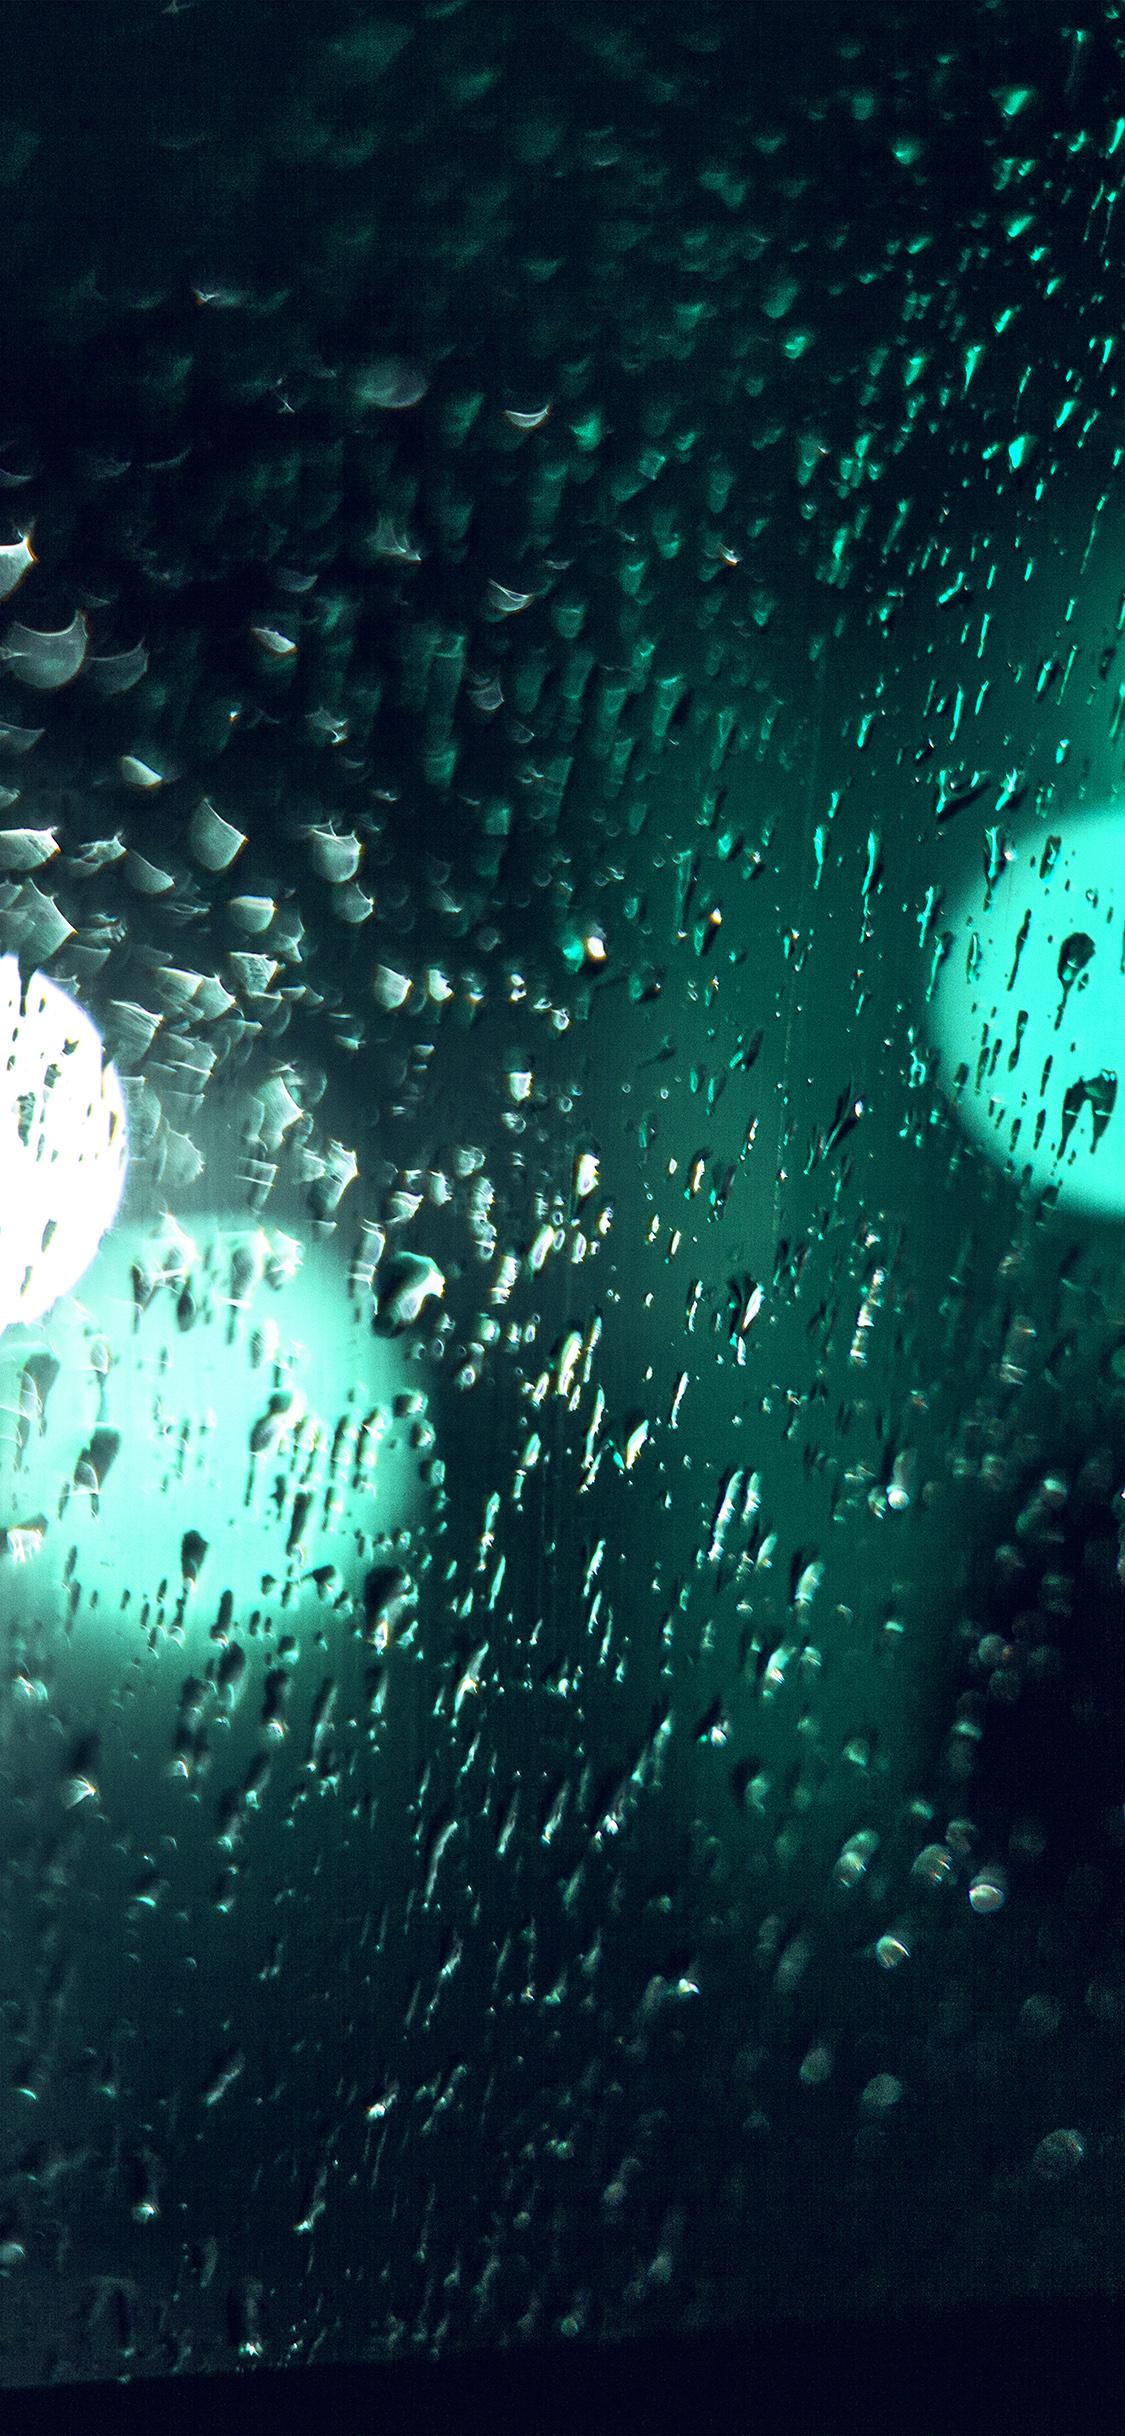 iPhonexpapers.com-Apple-iPhone-wallpaper-vl45-rainy-night-drops-bokeh-blue-green-light-pattern